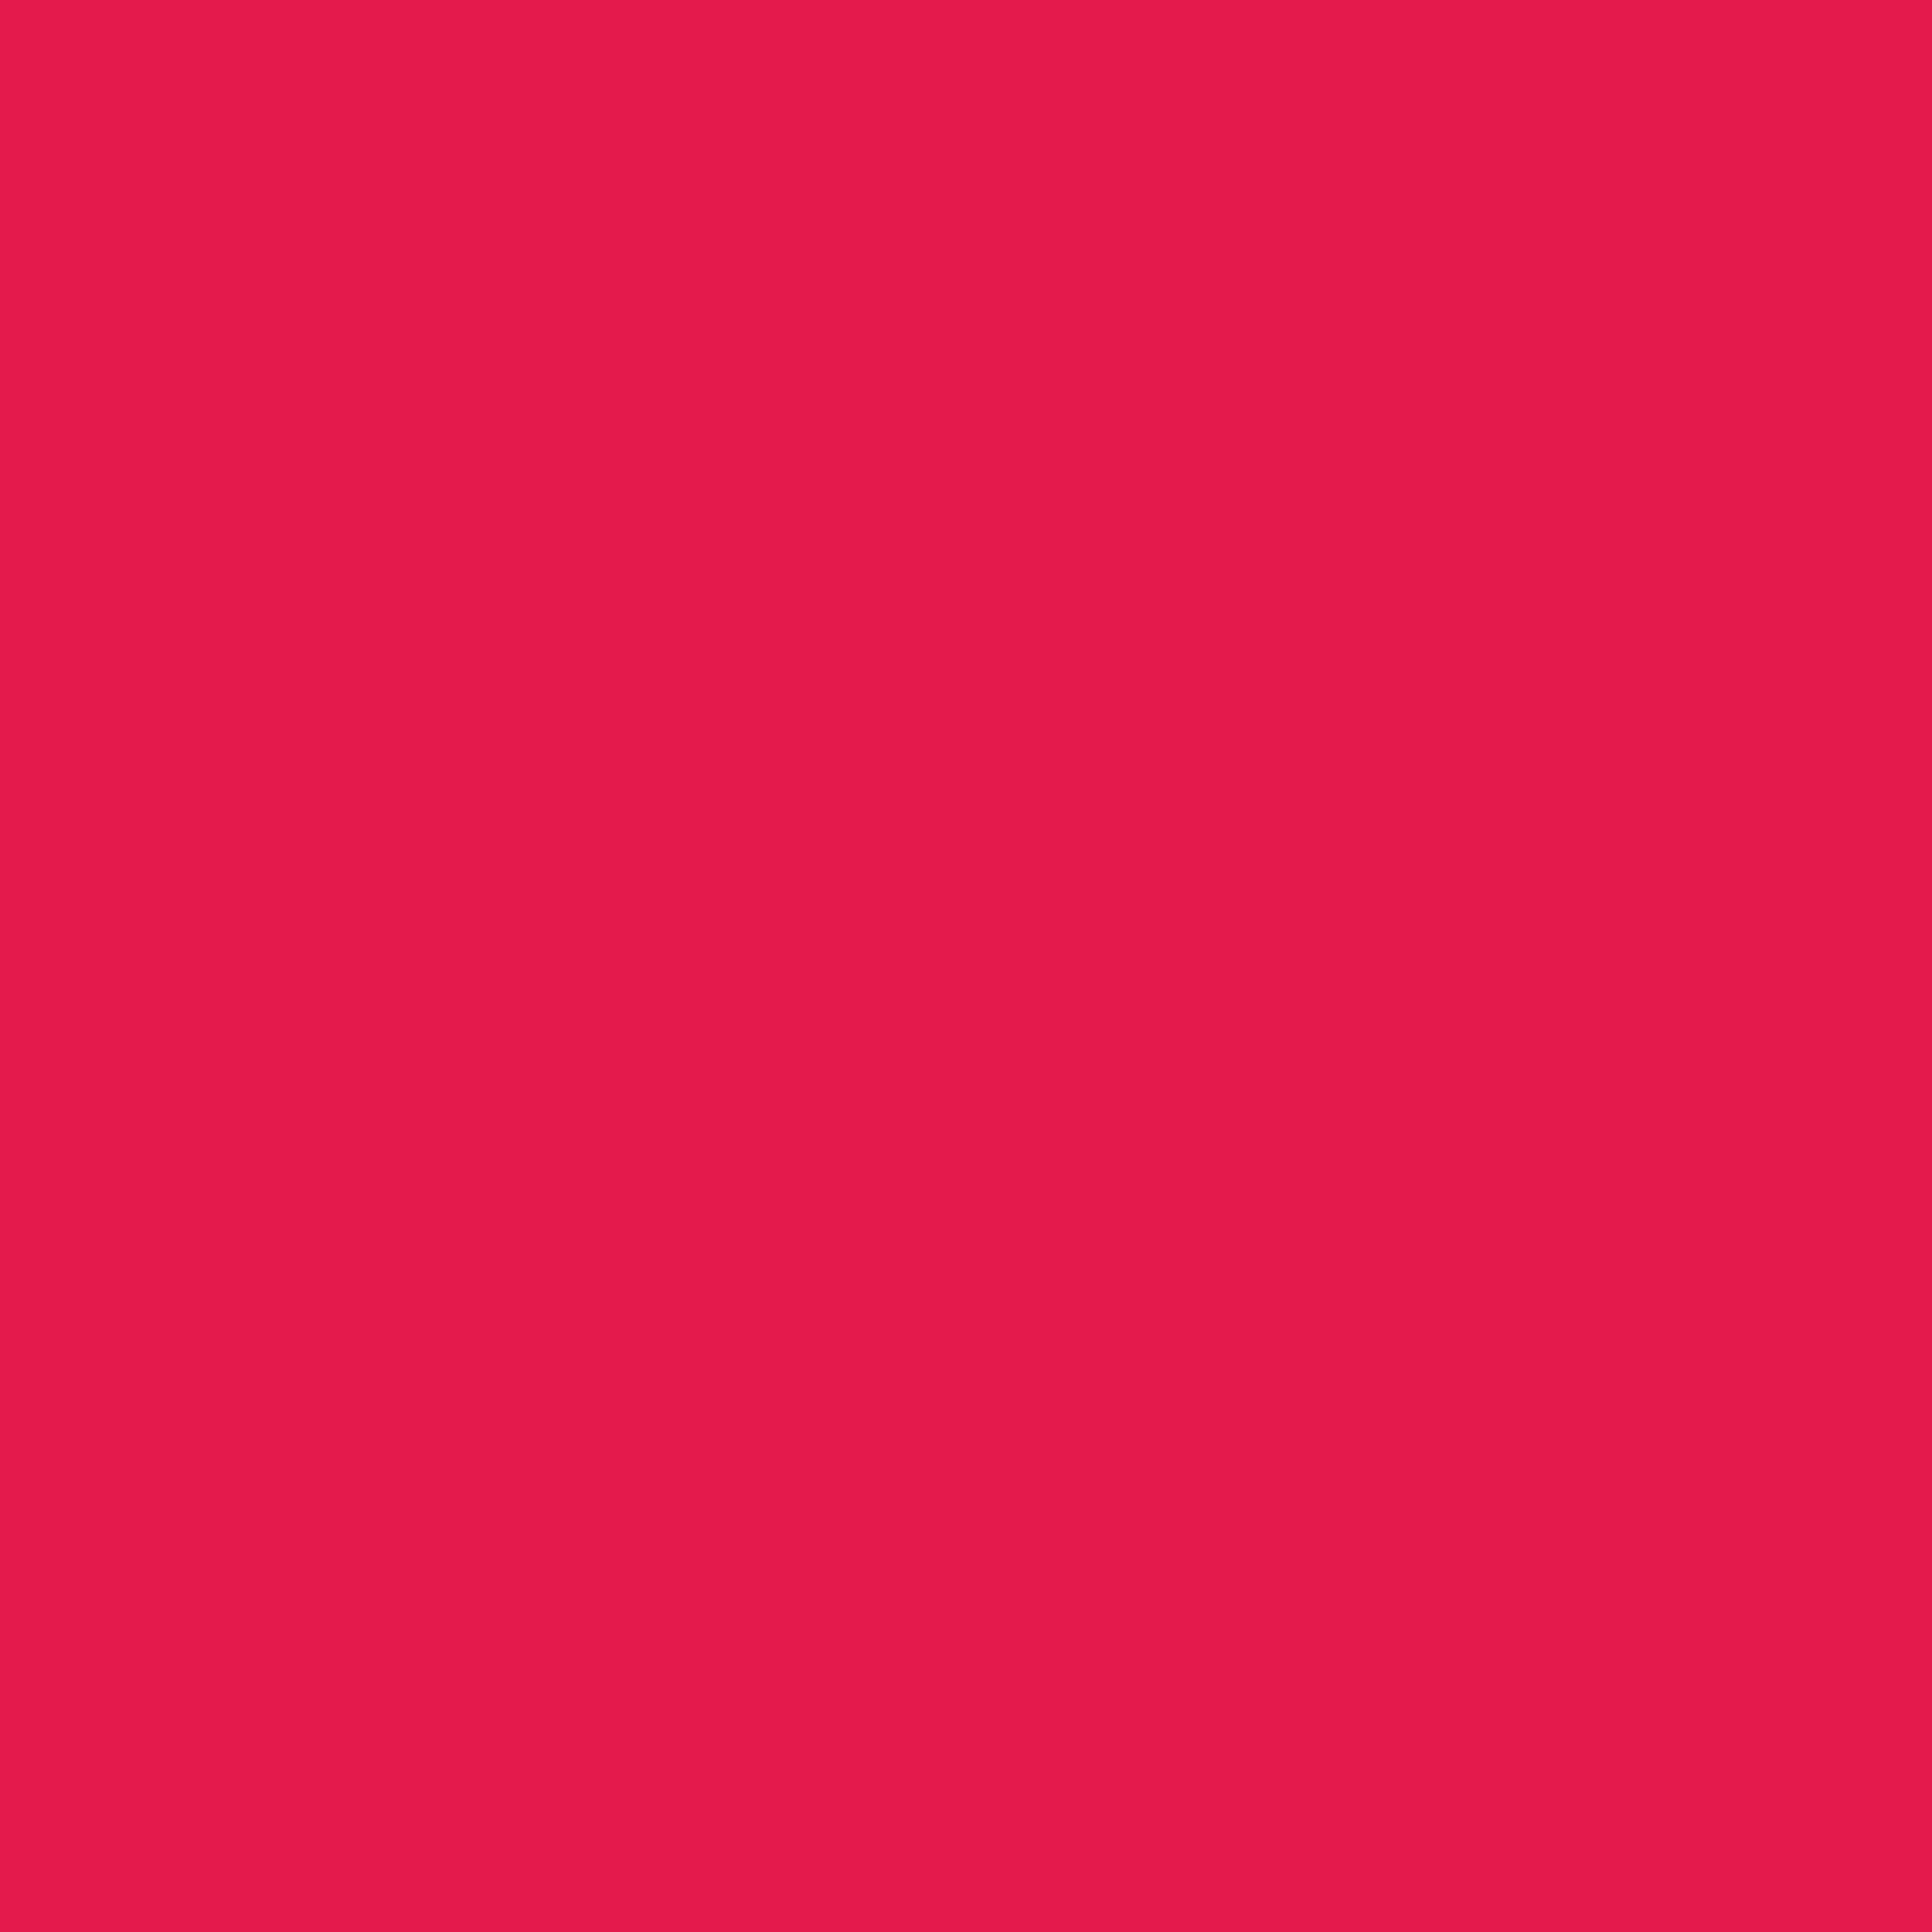 2048x2048 Spanish Crimson Solid Color Background